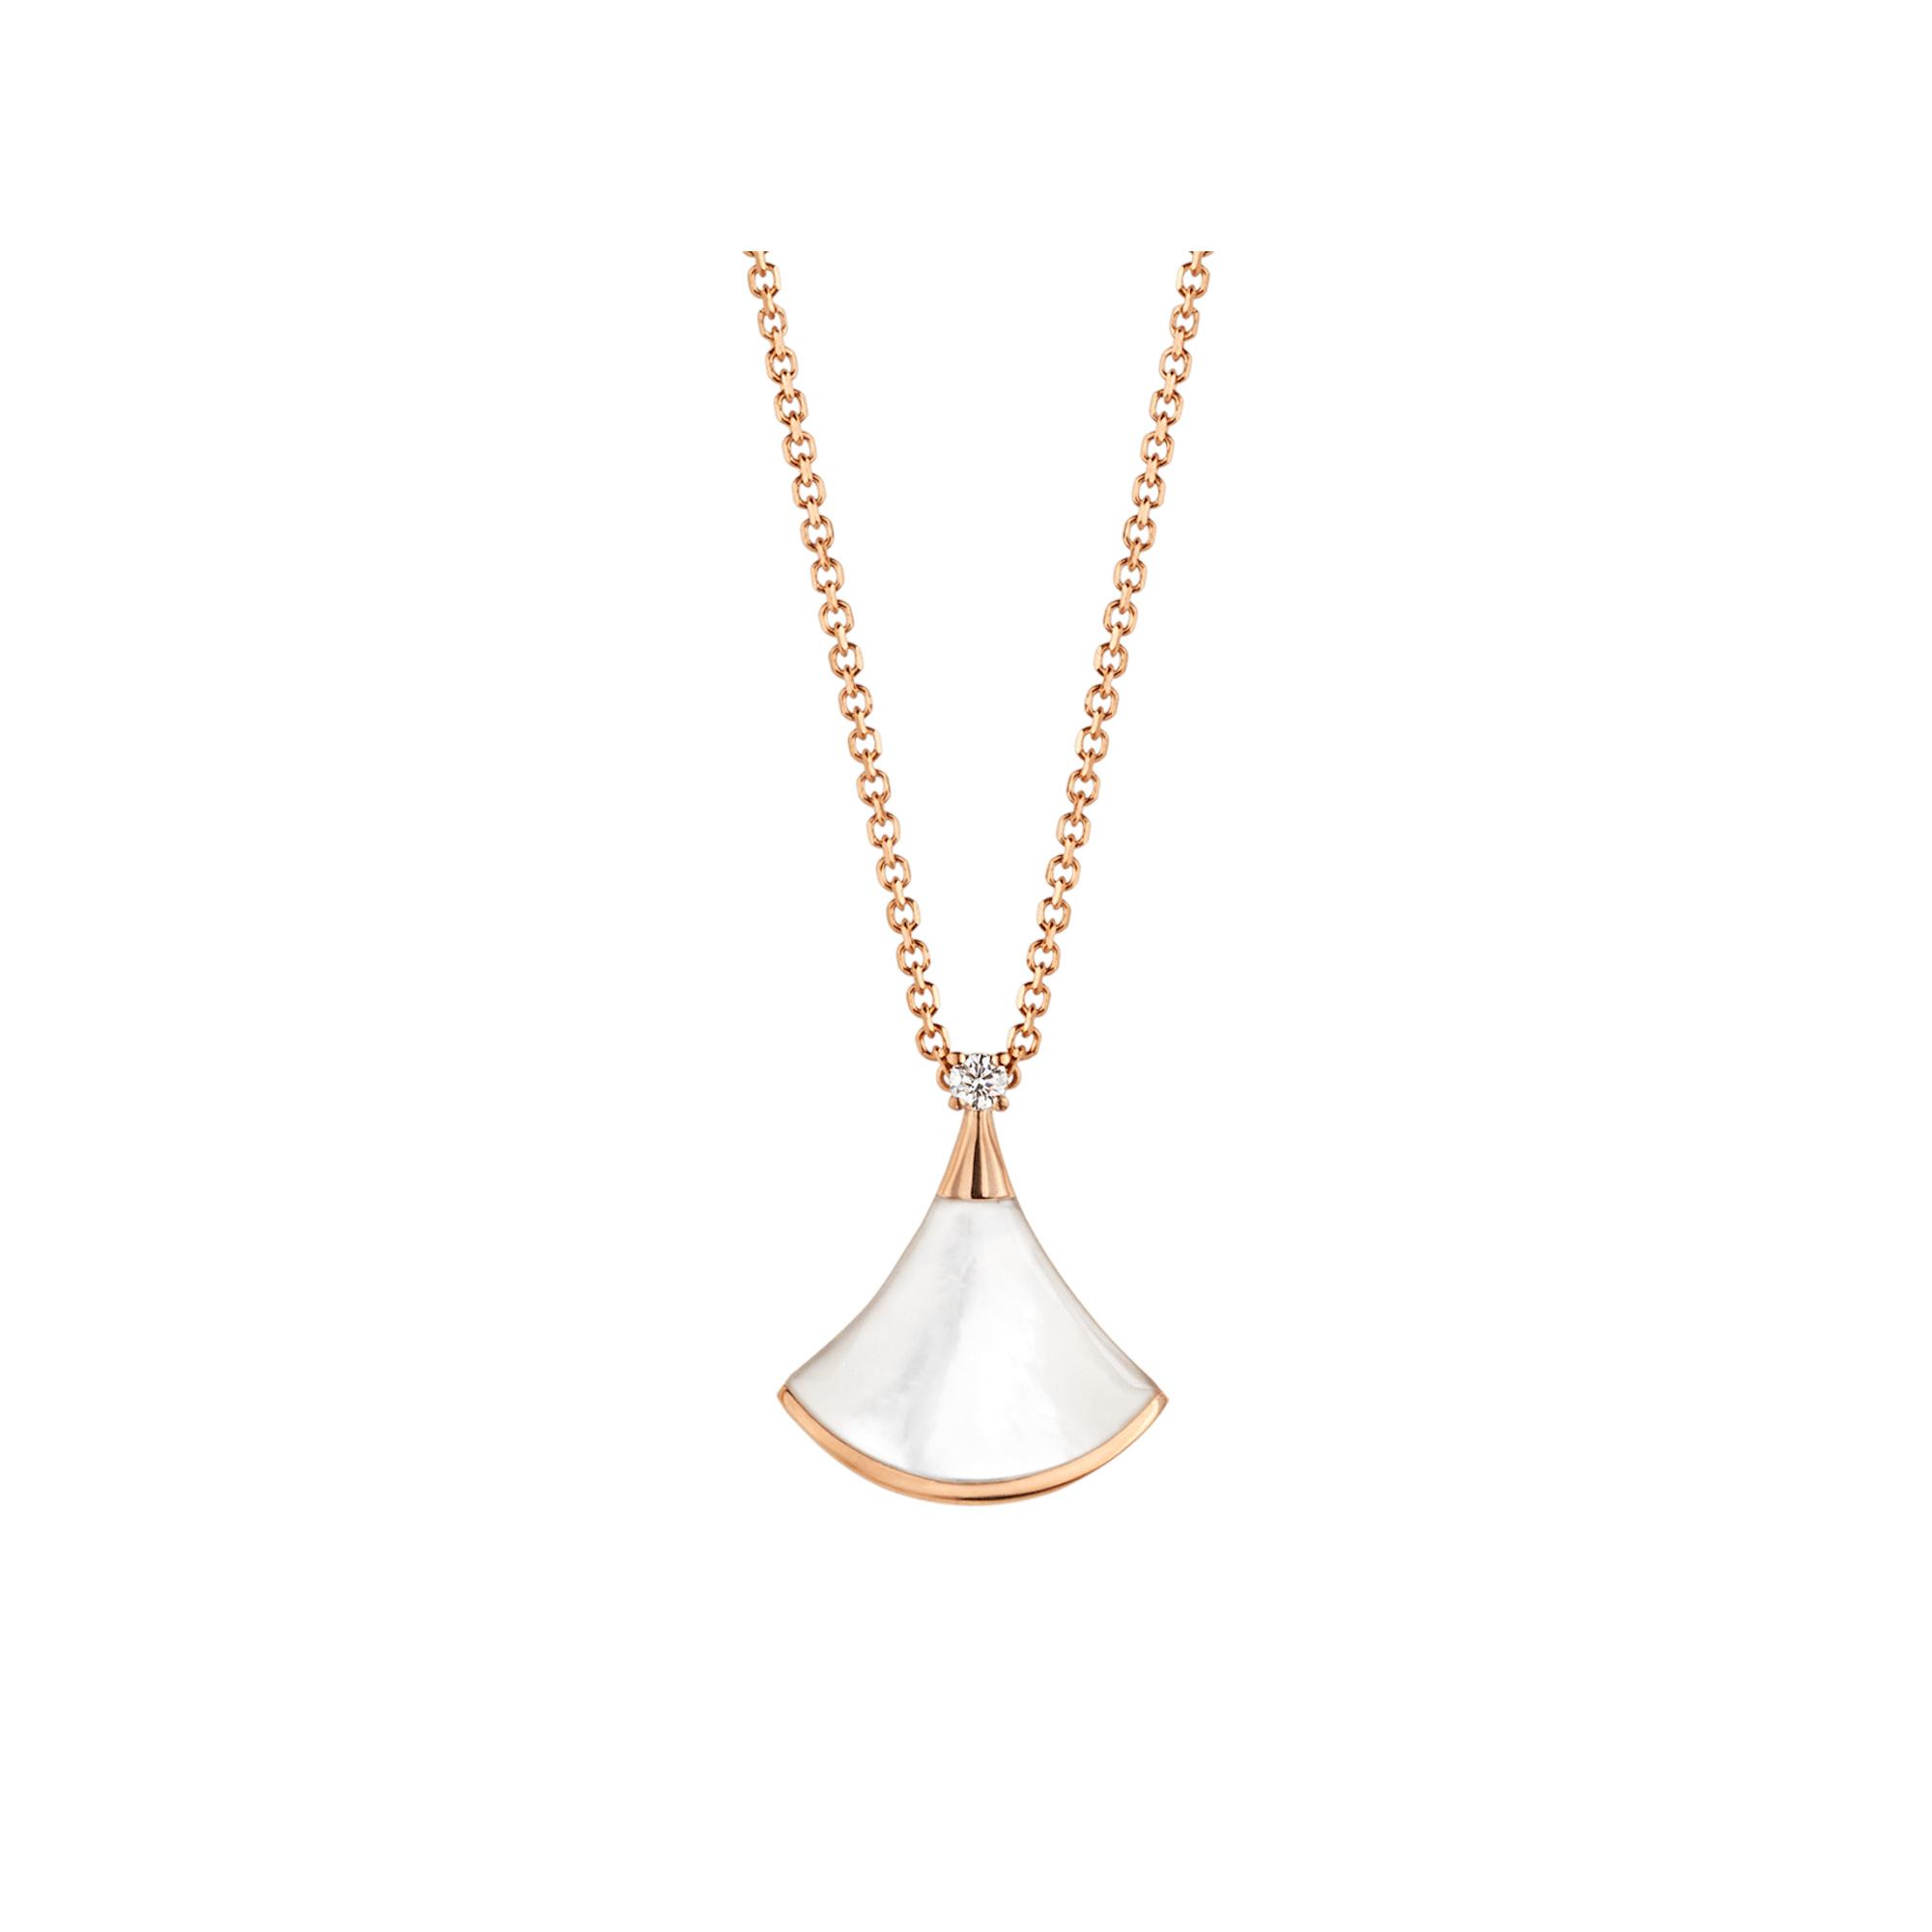 BVLGARI DIVAS' DREAM COLLANA necklace sconto discount